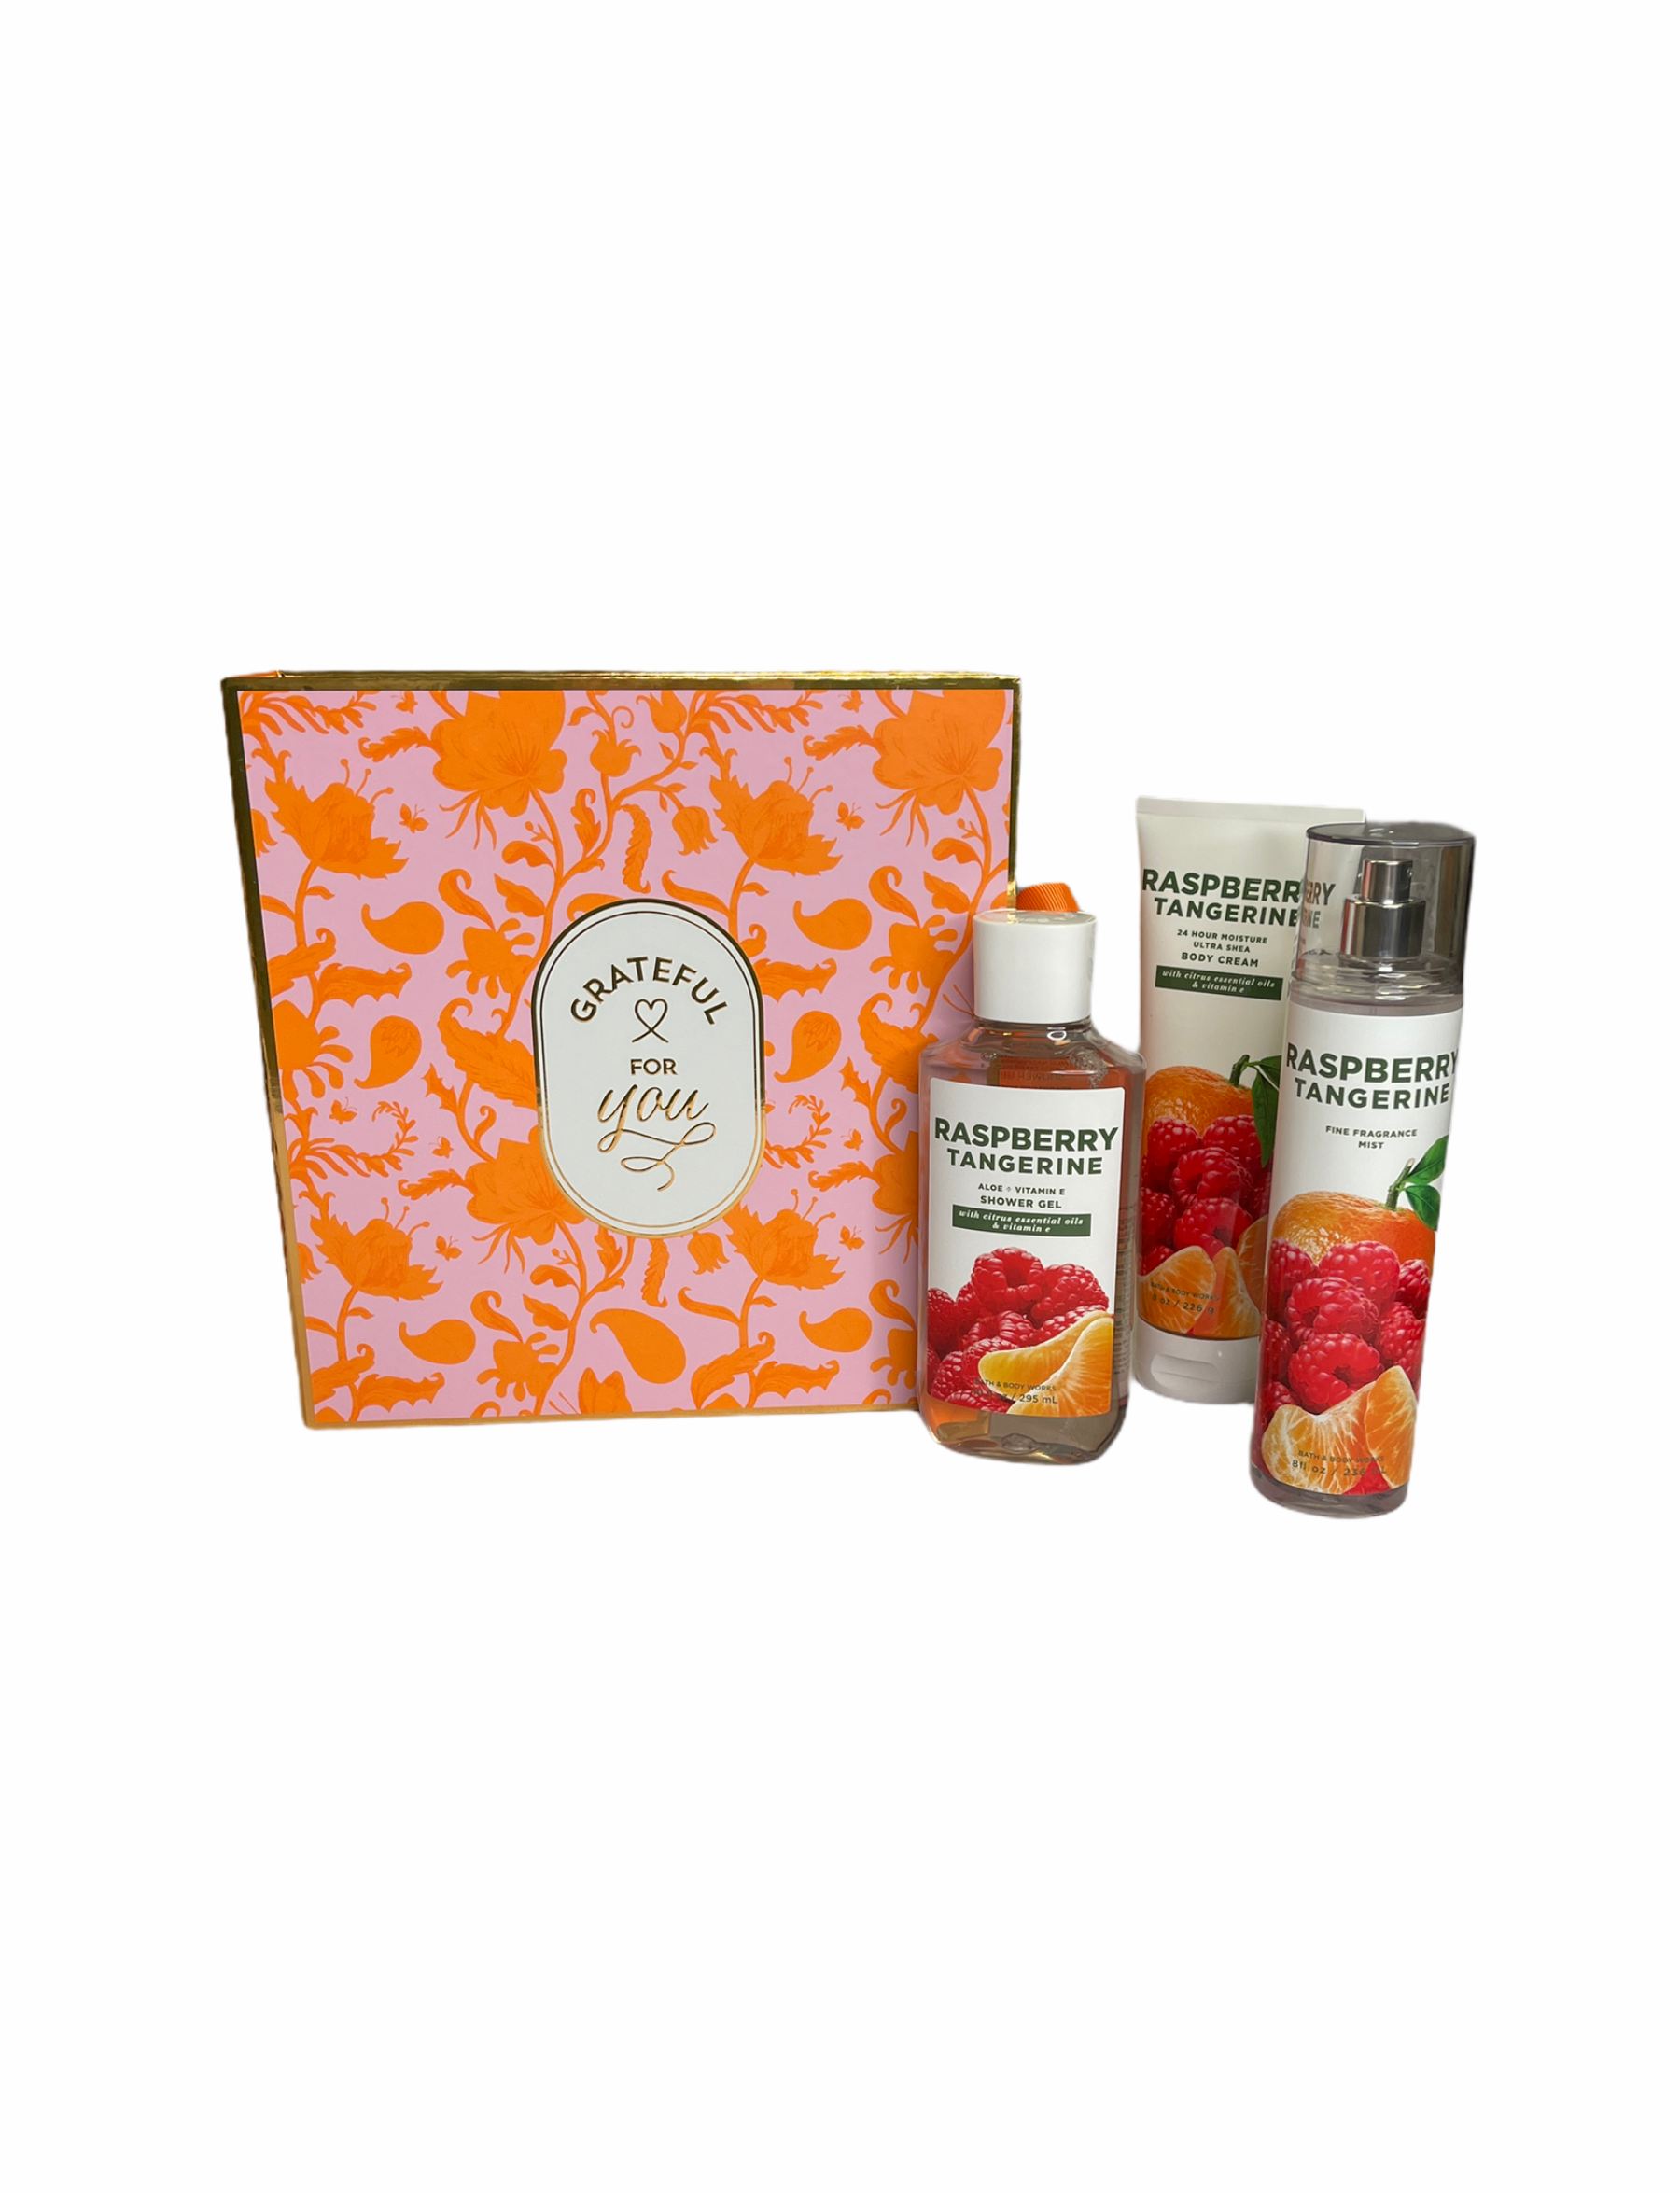 Rasberry Tangerine Gift Box Set